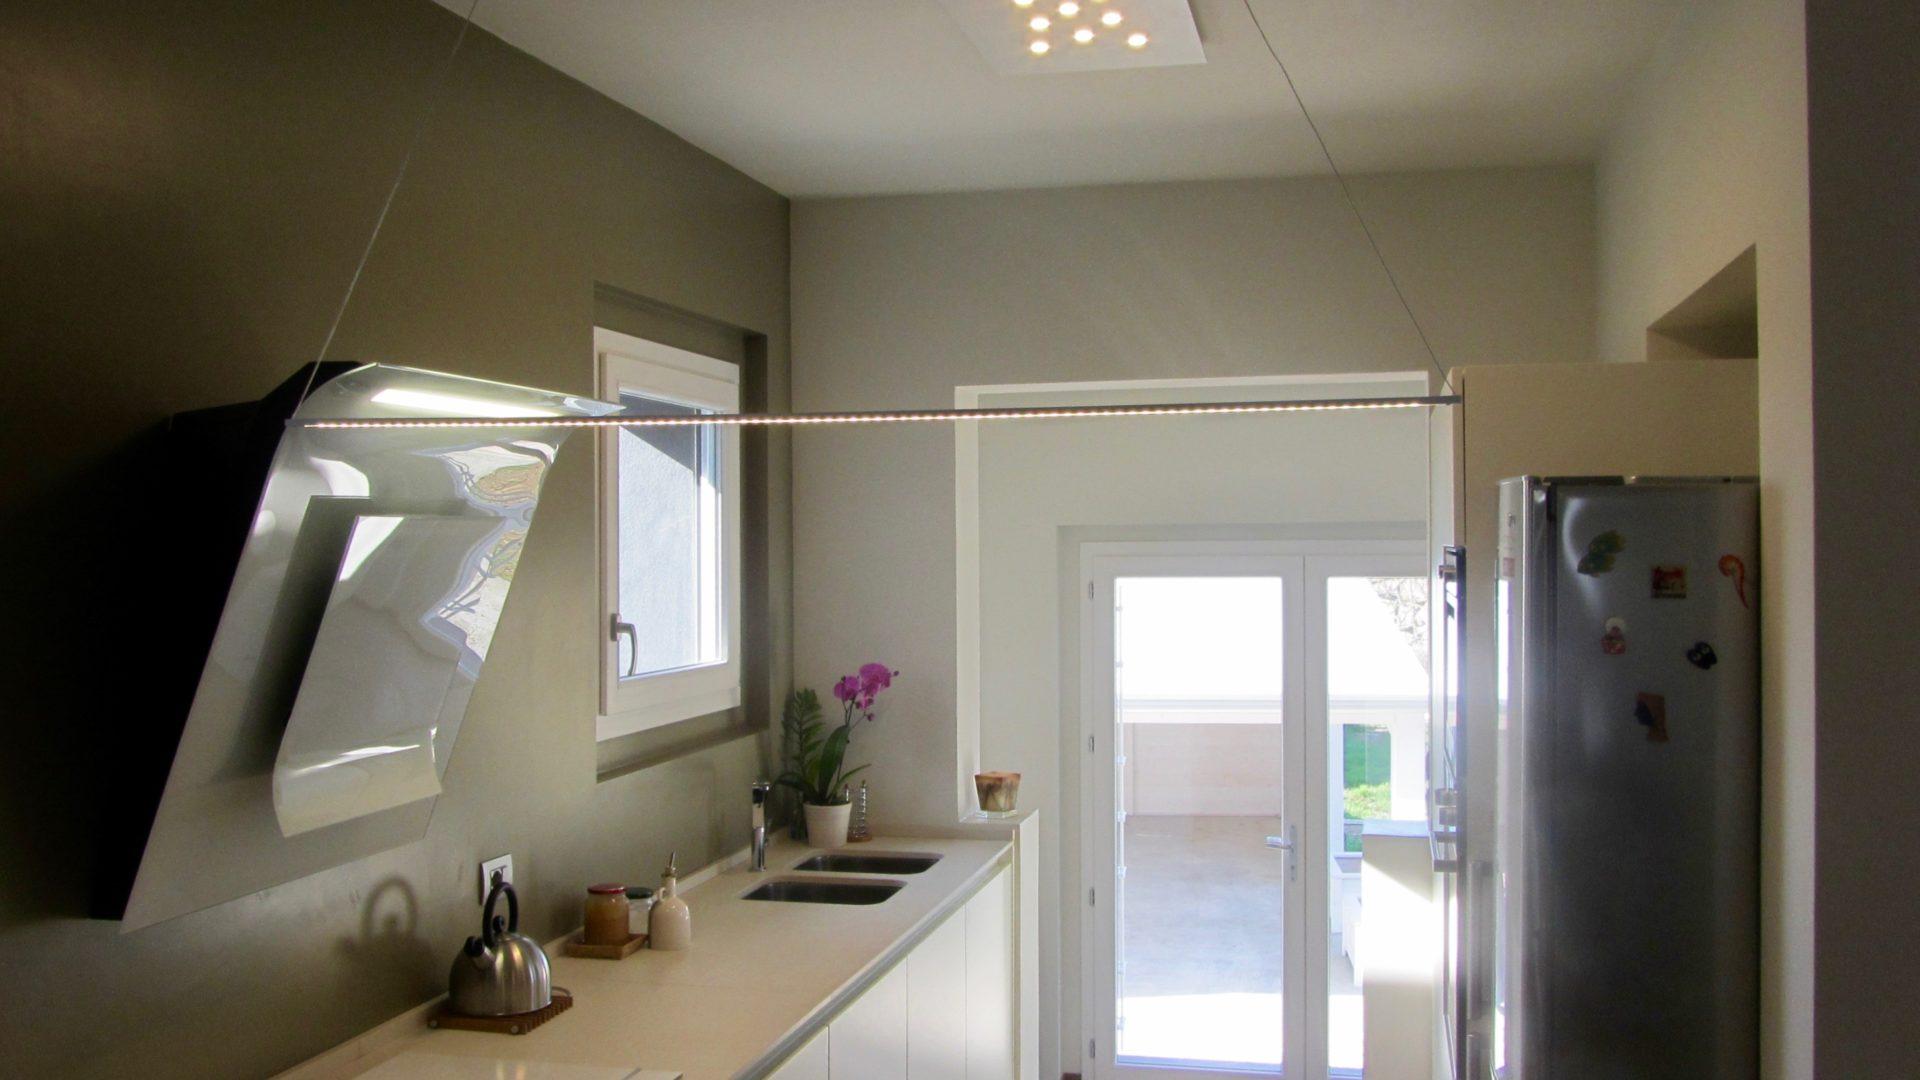 Bancone cucina con sgabelli. awesome disegno bancone cucina with